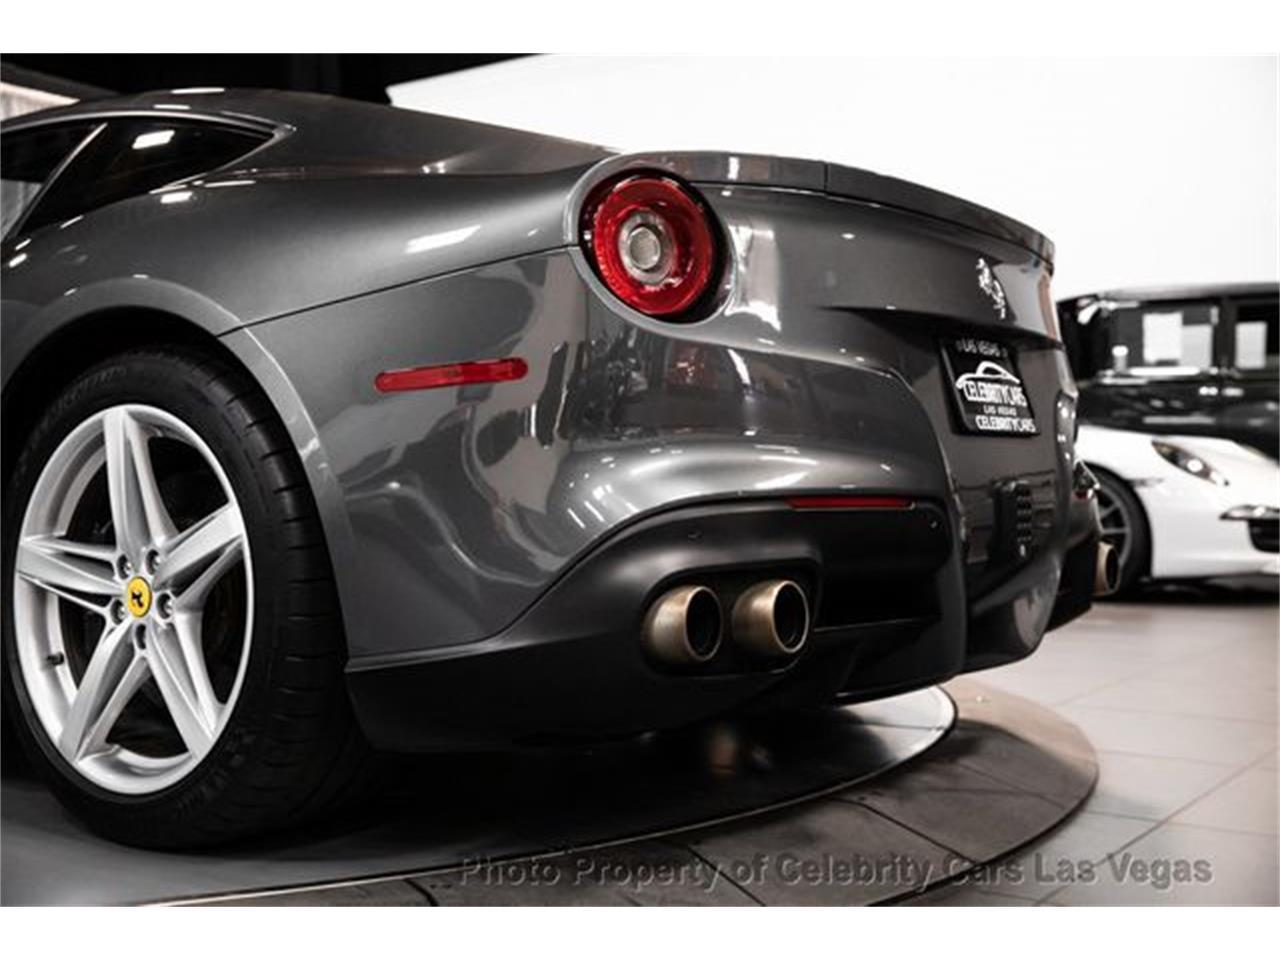 2014 Ferrari F12berlinetta (CC-1411525) for sale in Las Vegas, Nevada